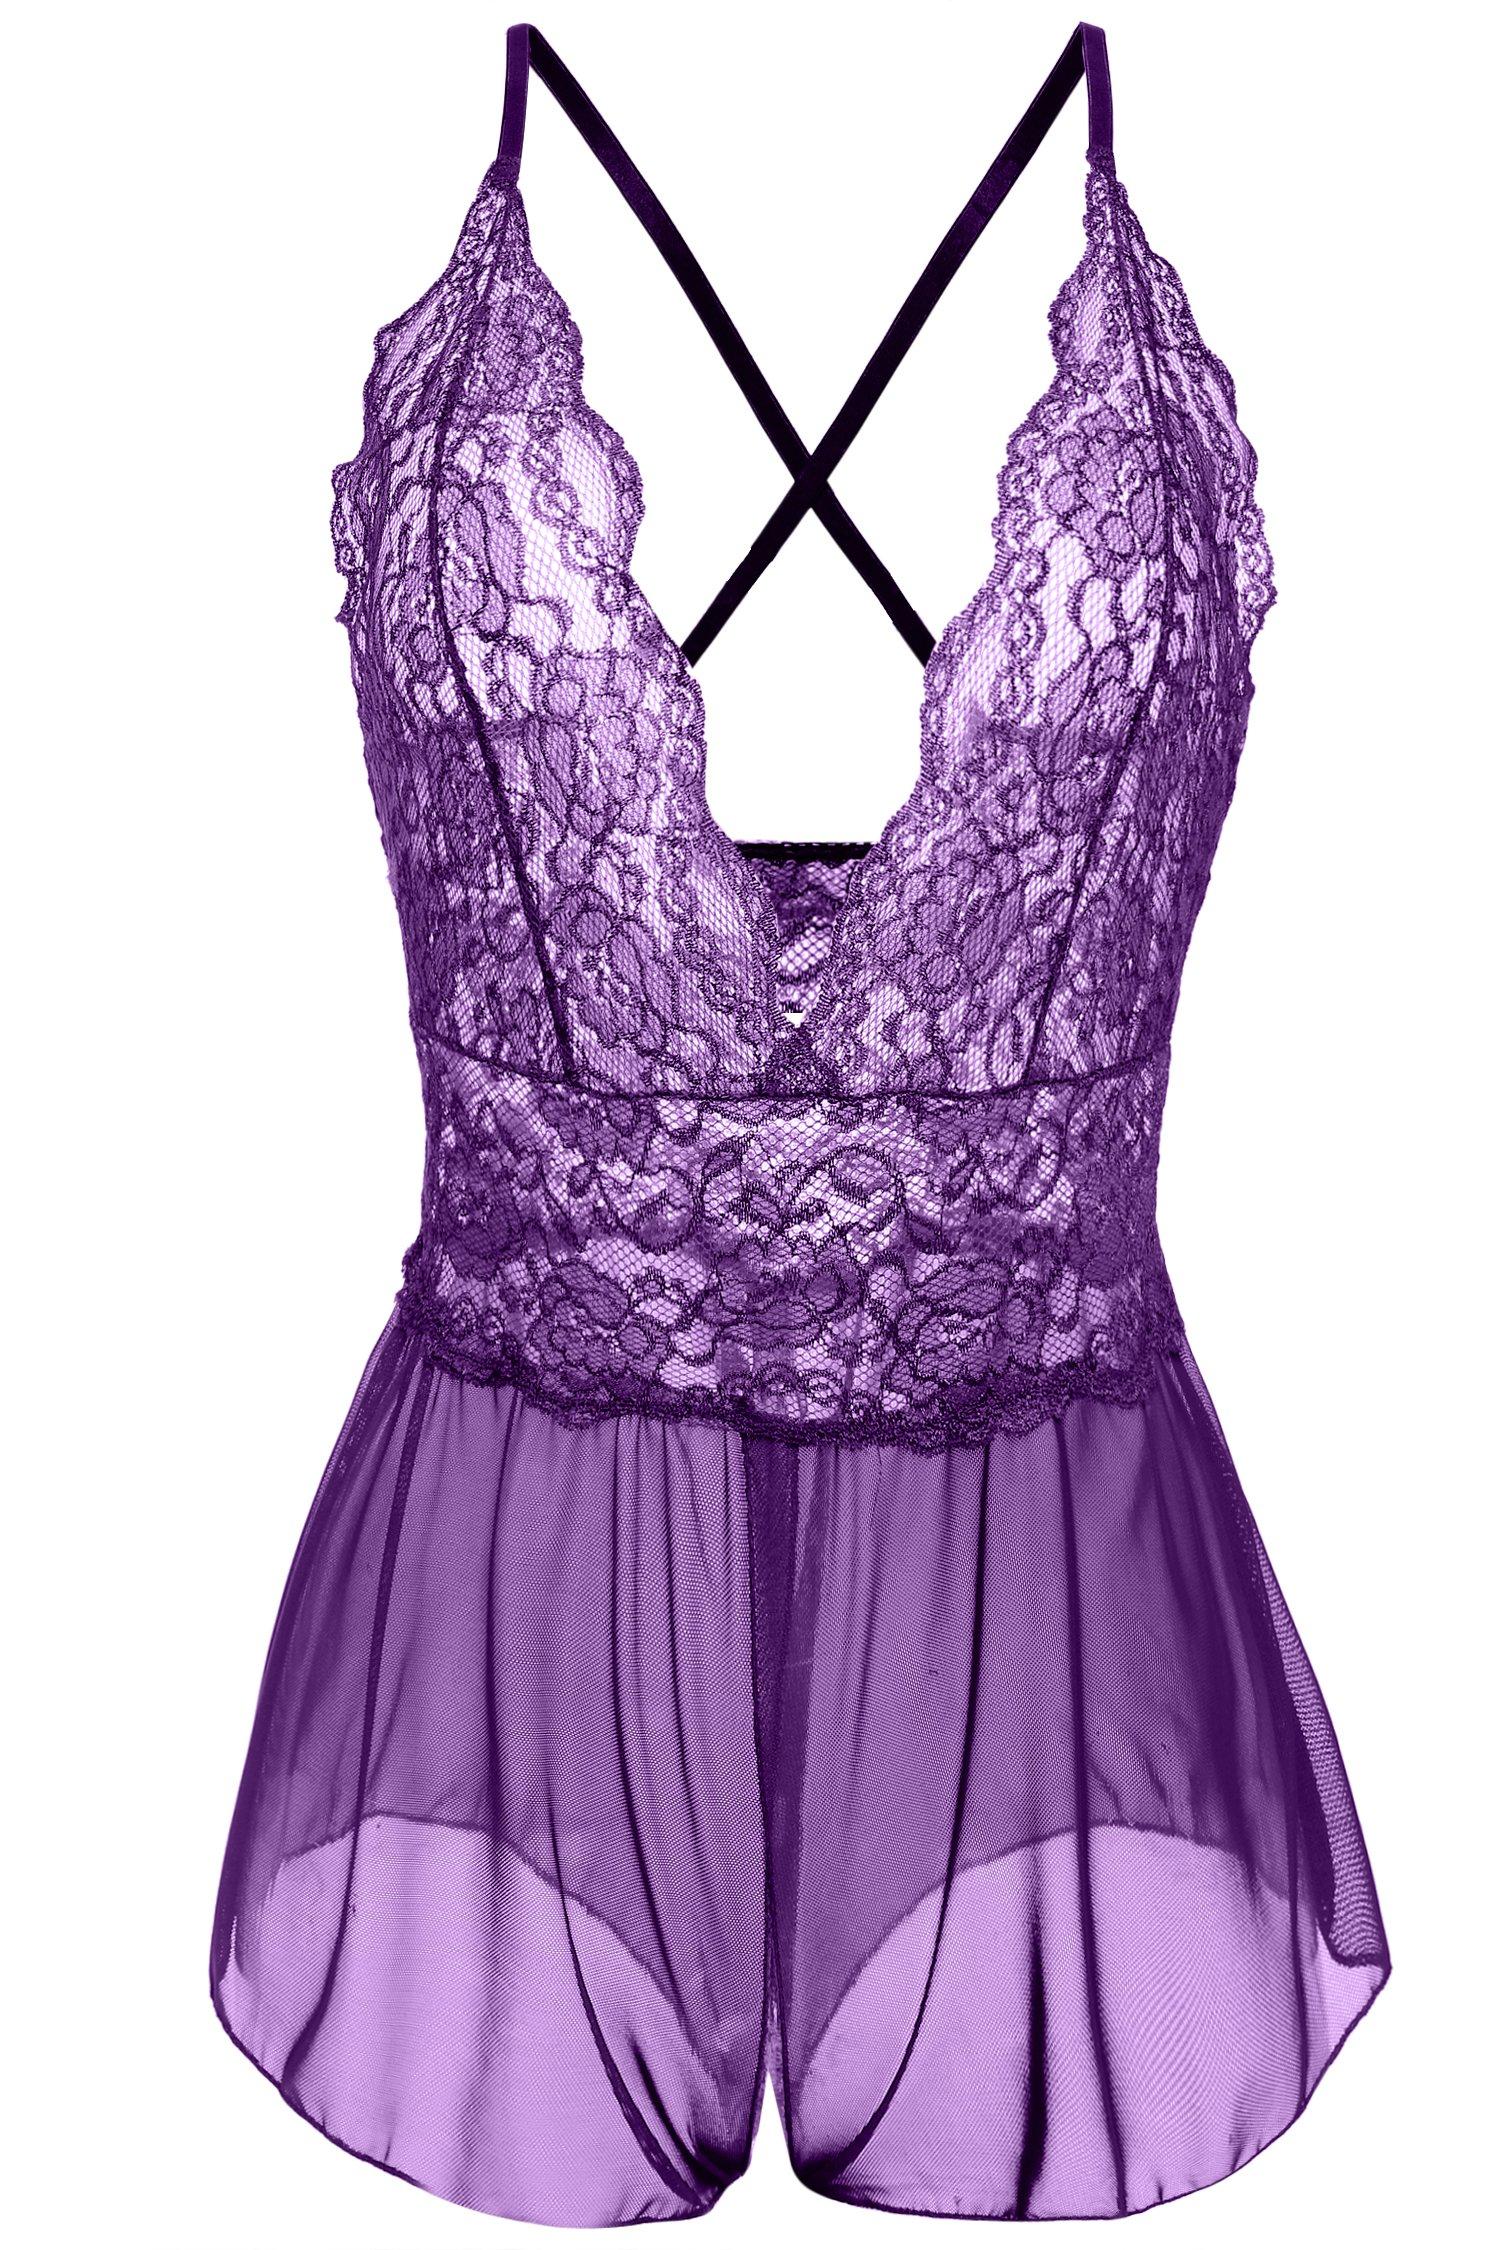 Avidlove Women Sexy Lingerie Lace See-Through Babydoll Open Crotch Pant Dress (XXL = US XL, Purple (FBA))